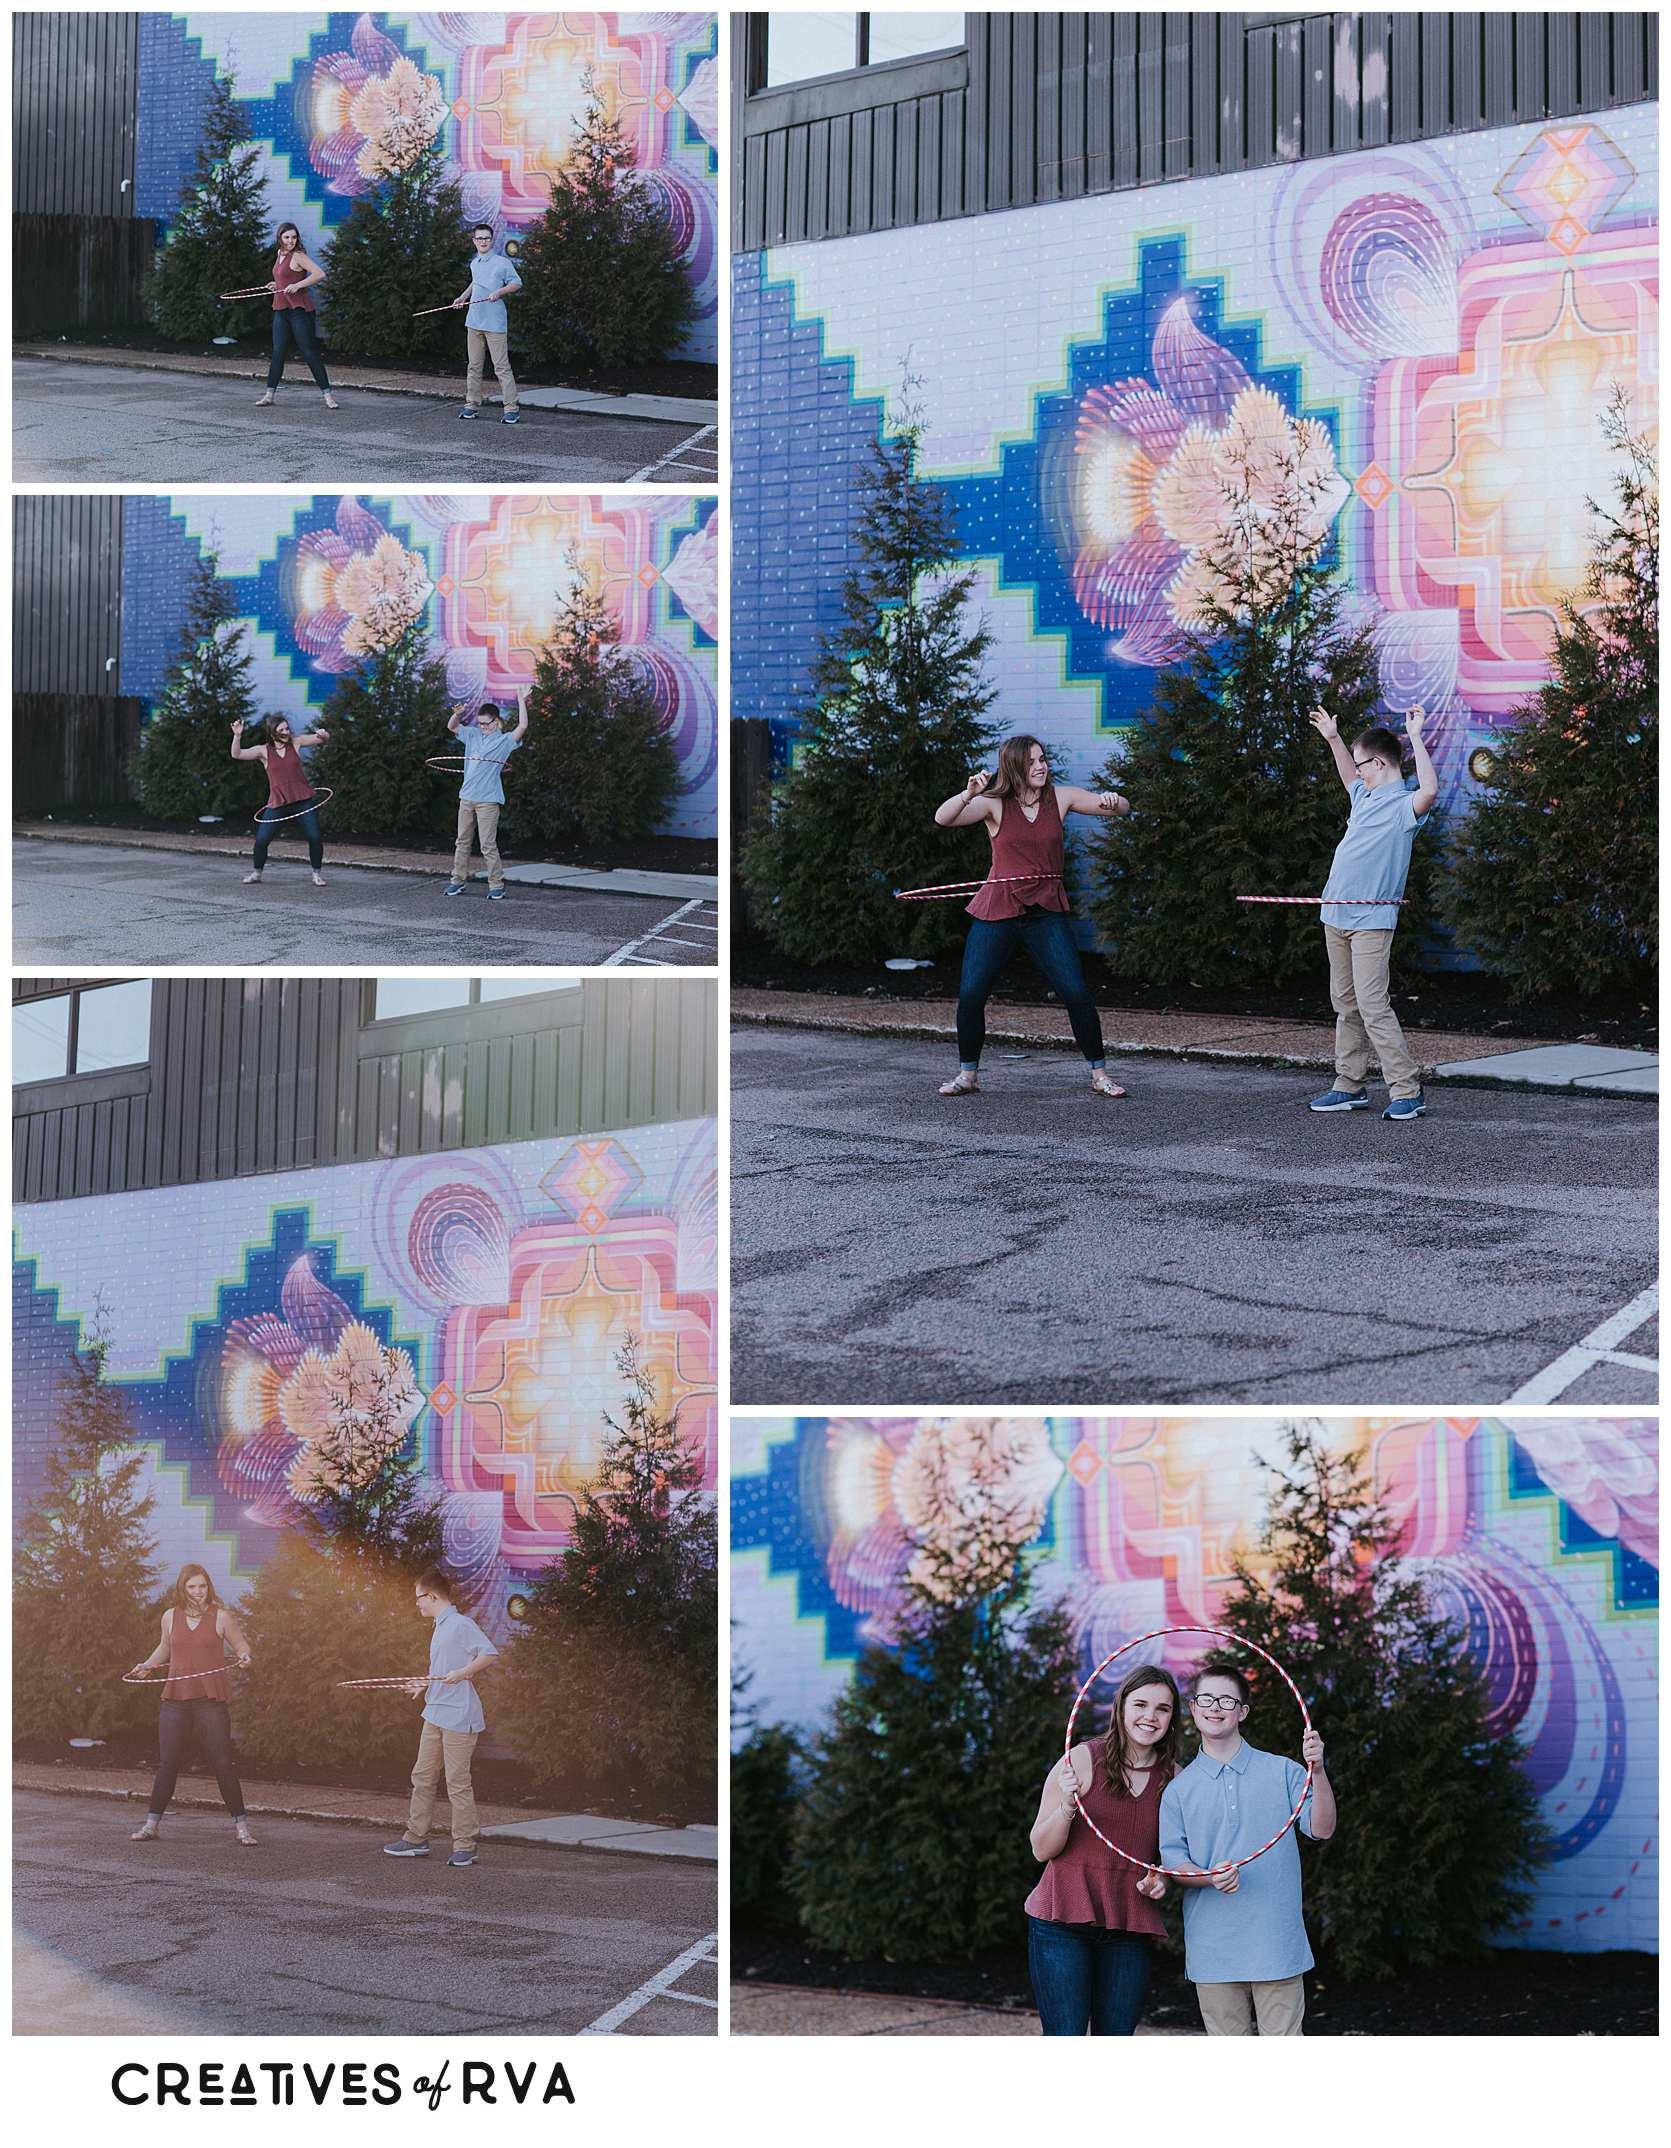 SPARC-FIRST-FRIDAYS-LIVE-ART-GIANNA-GRACE-PHOTOGRAPHY_0021.jpg